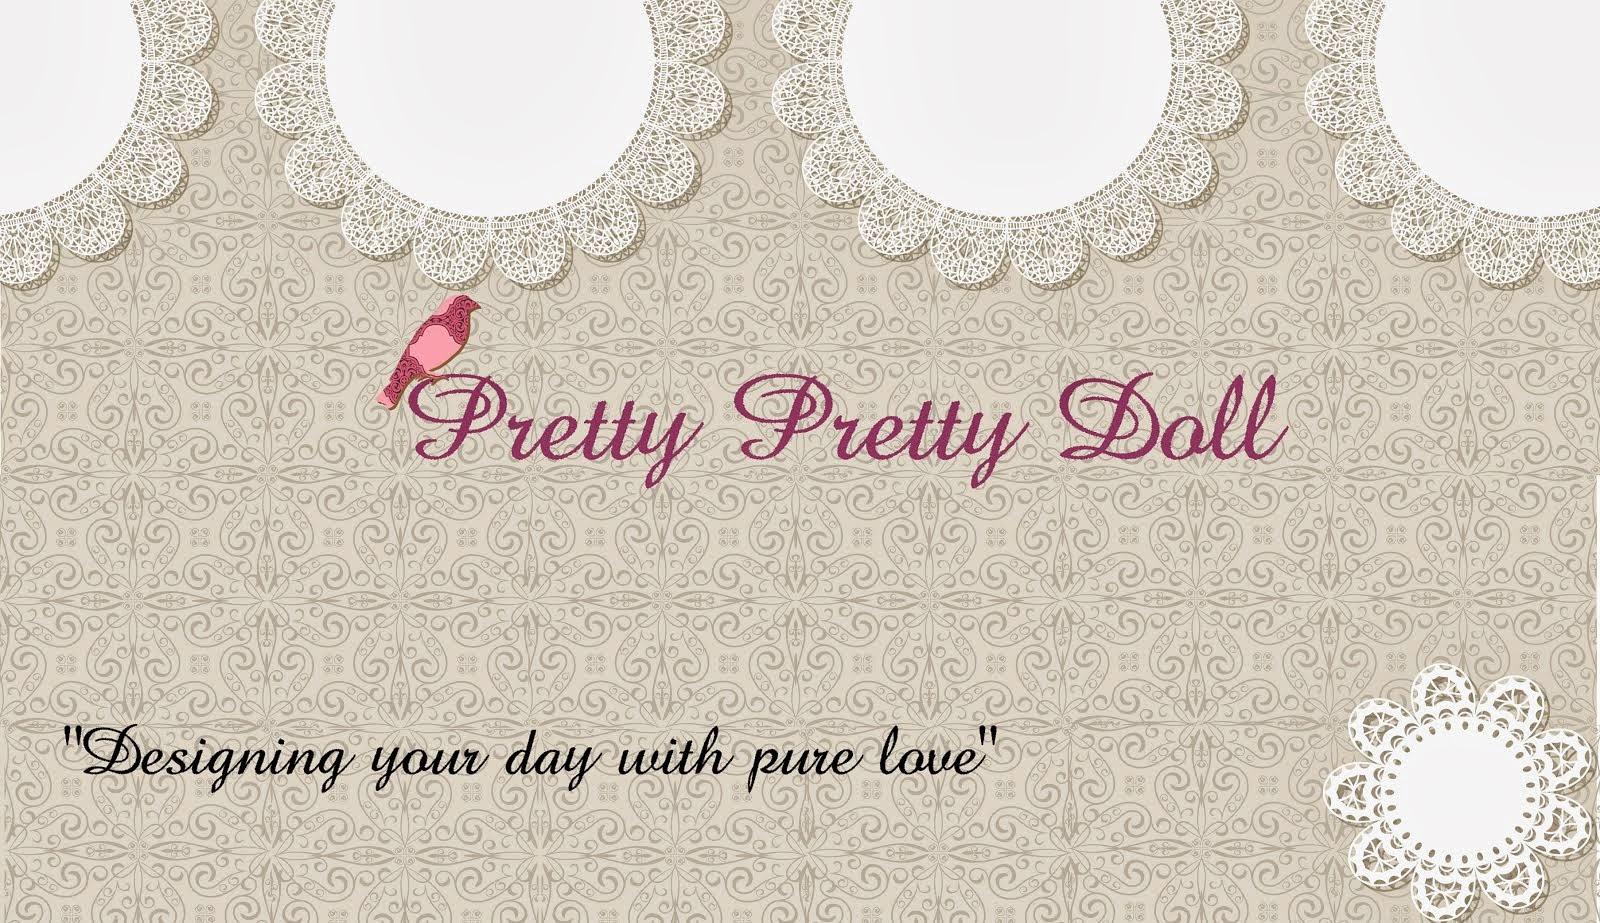 Pretty Pretty Doll